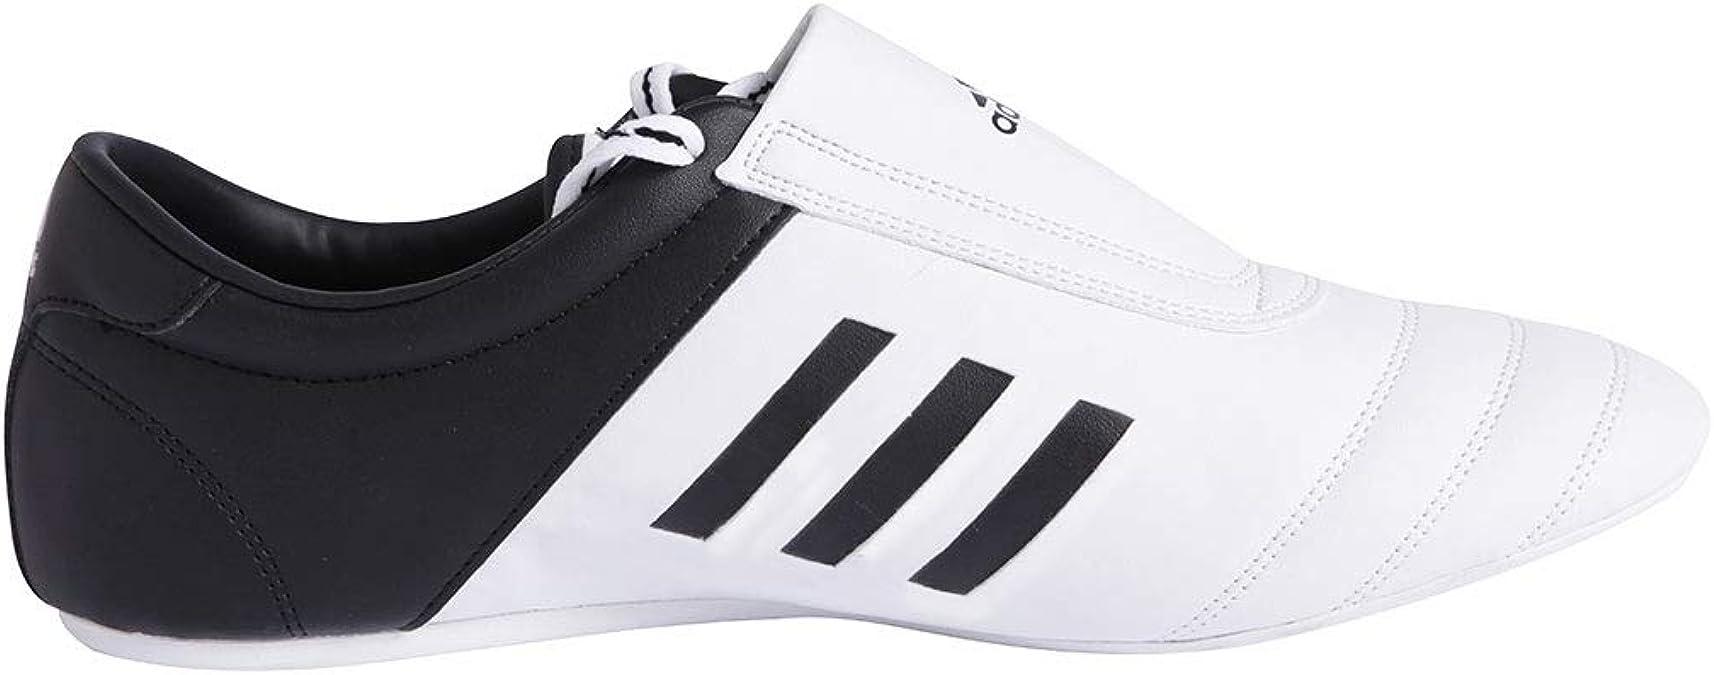 Adidas Arti Marziali Scarpe Da Ginnastica Adi Kick Karate